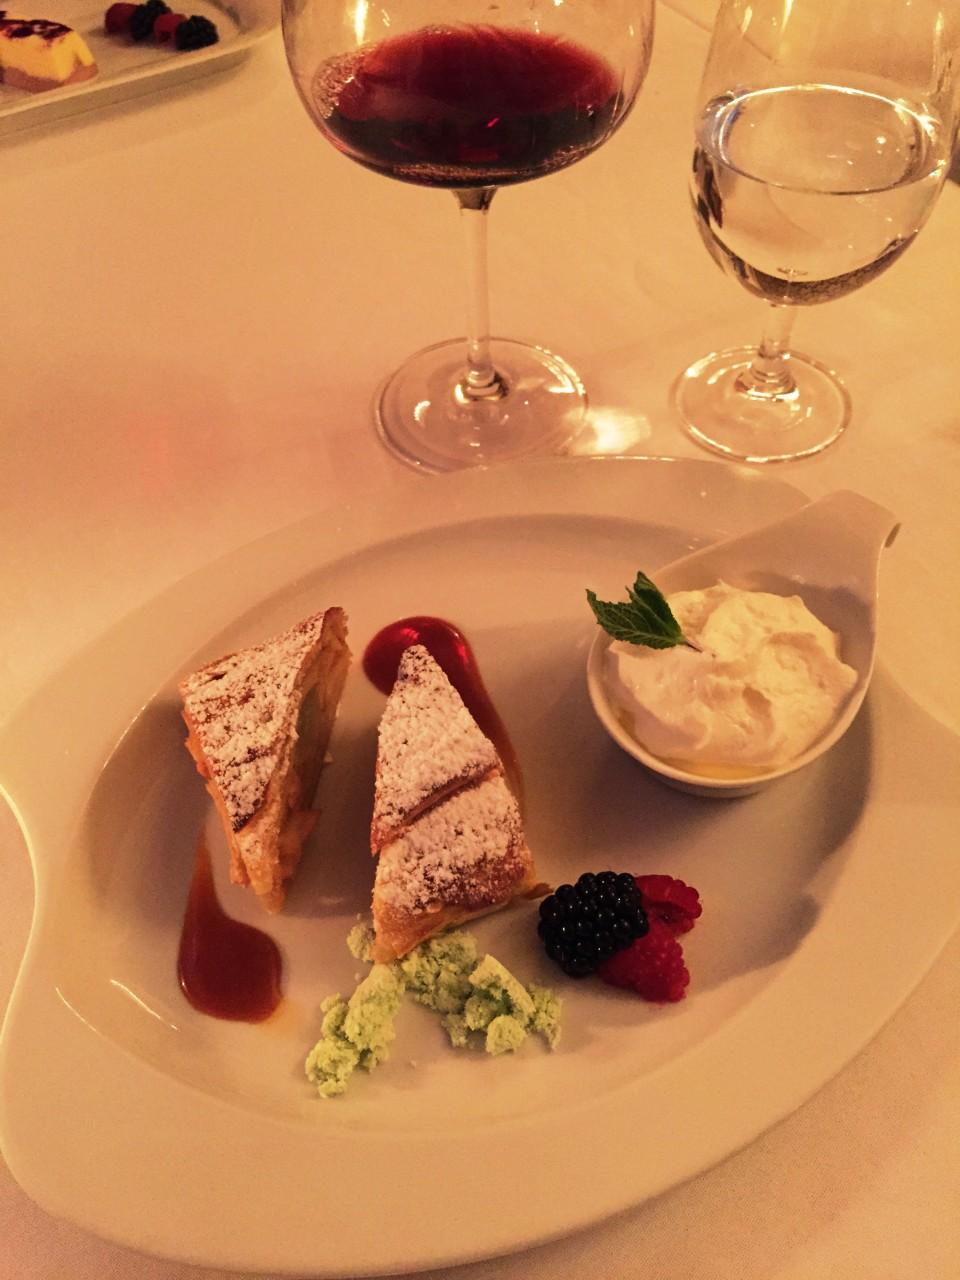 Piano Nobile at Villa Richter : Warm Apple Strudel with vanilla ice cream and caramel sauce